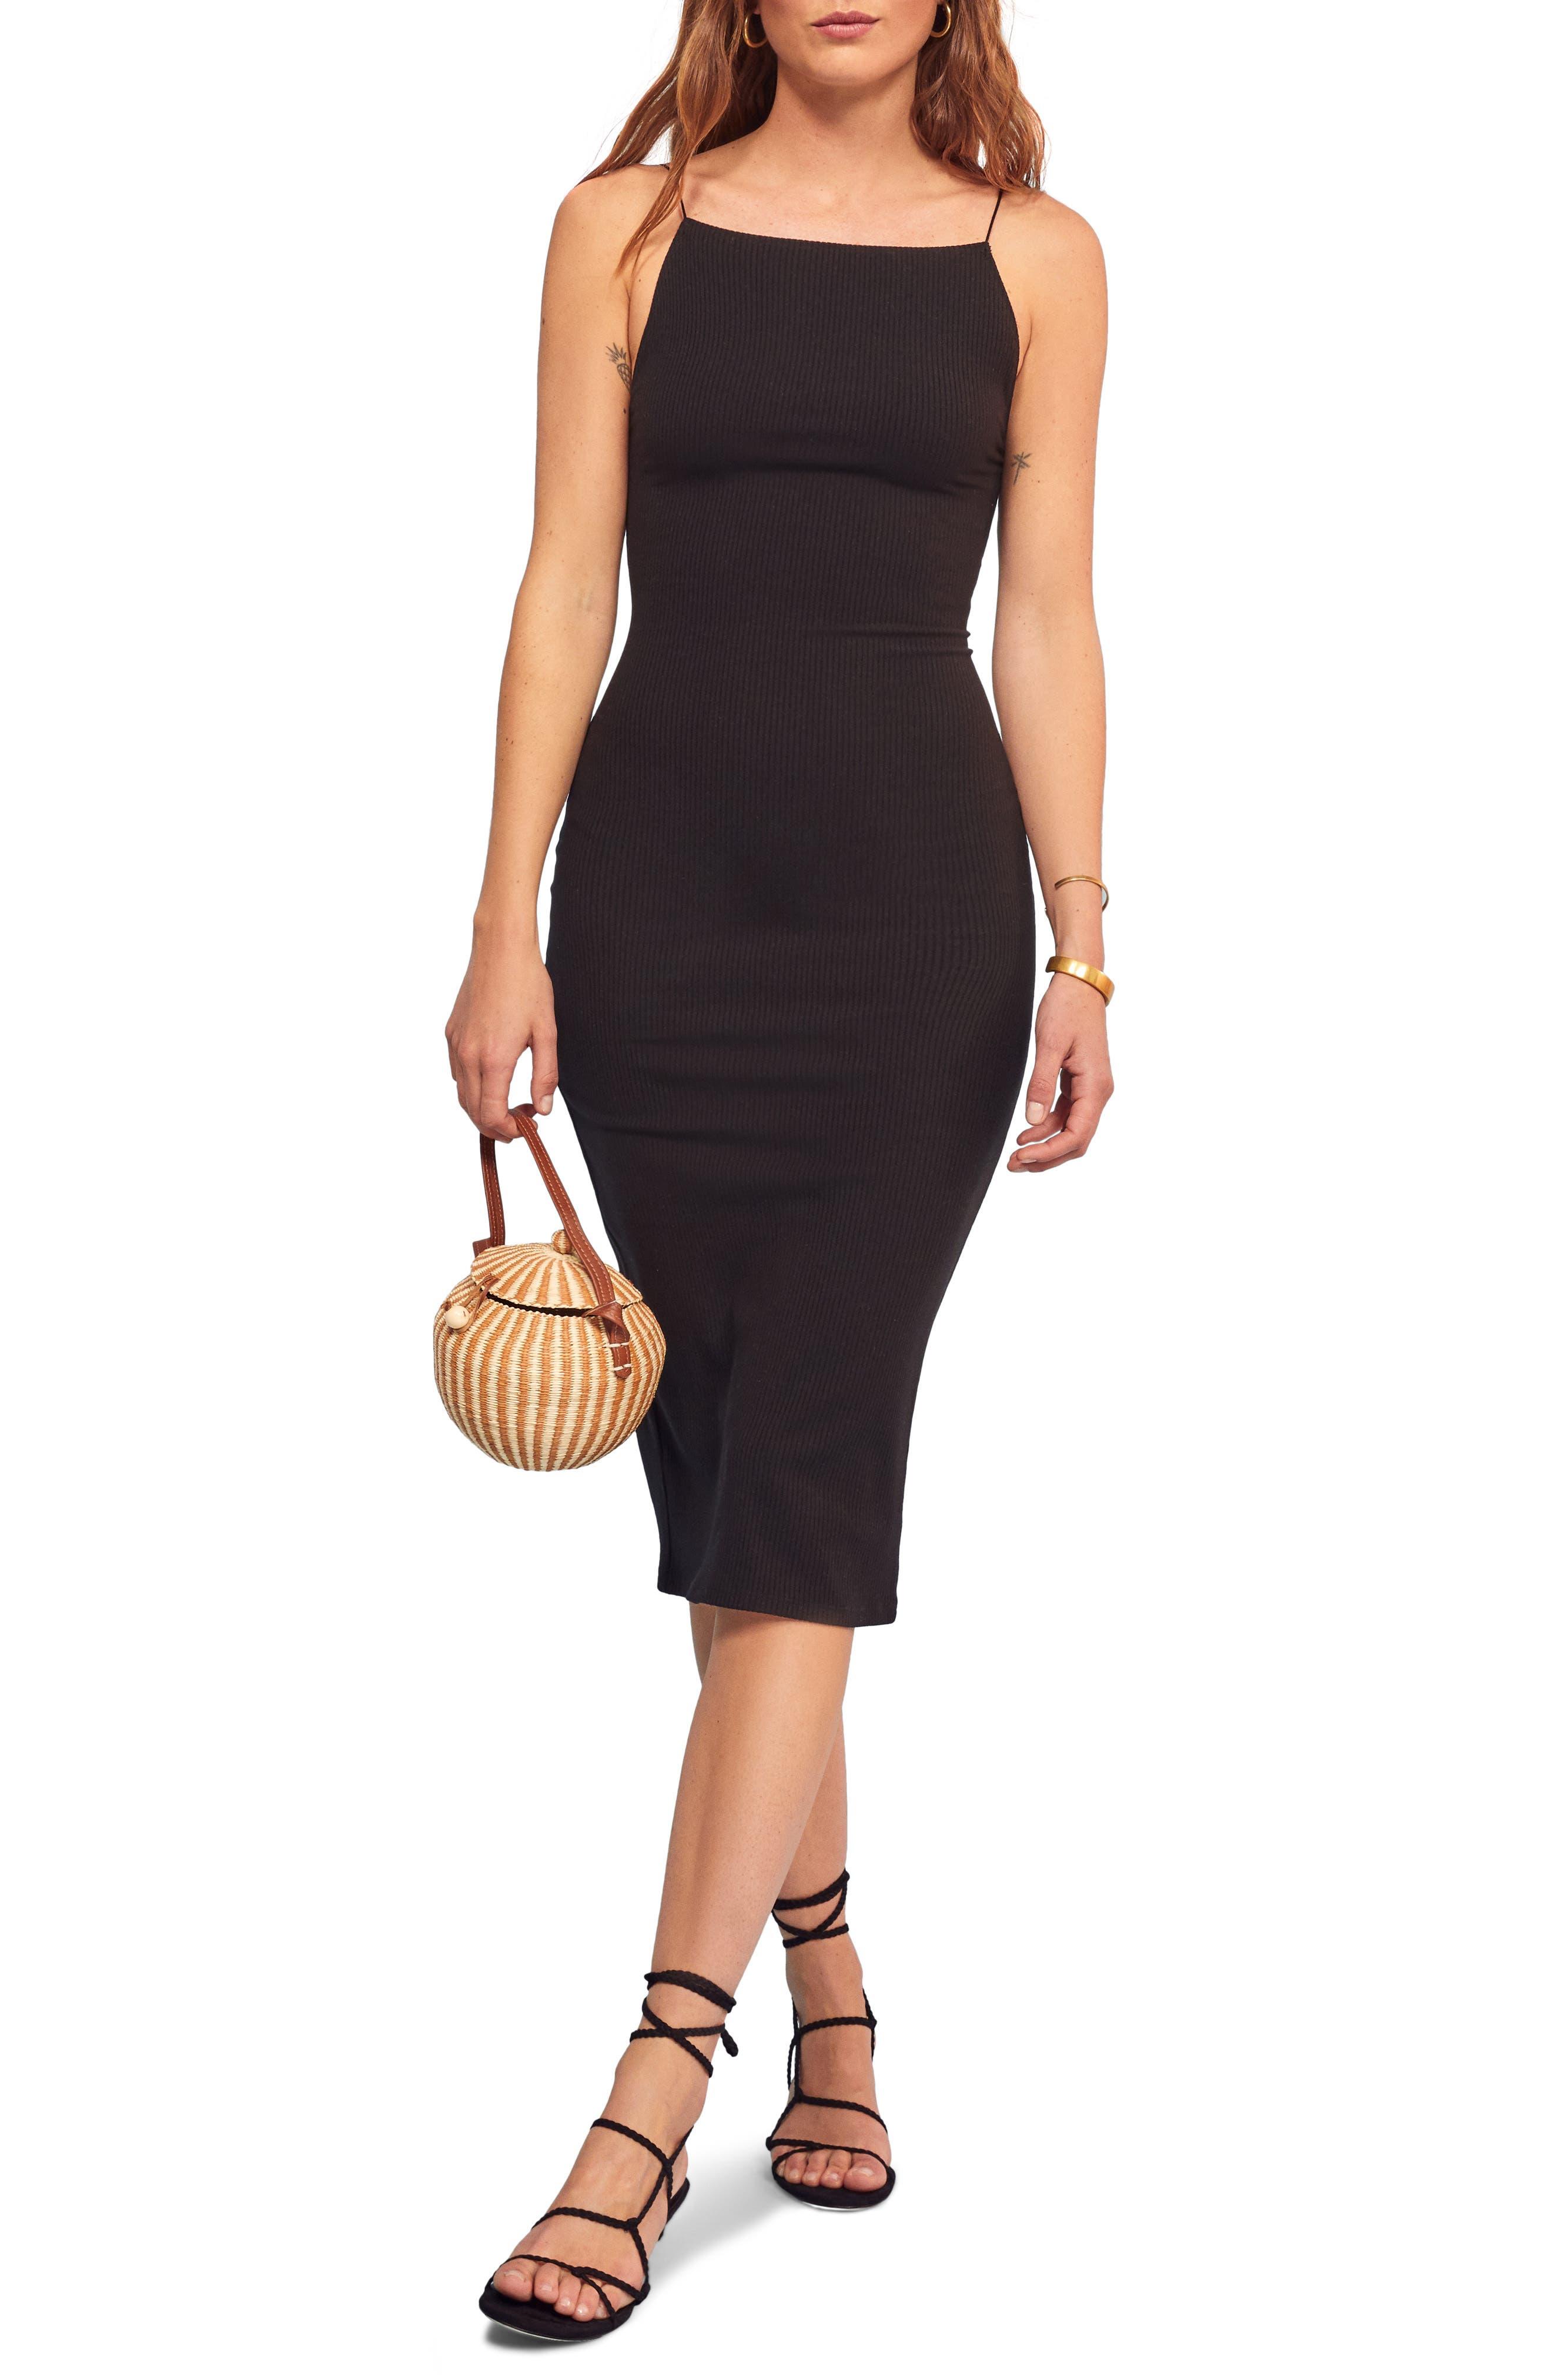 Reformation Rockie Sleeveless Body-Con Dress, Black